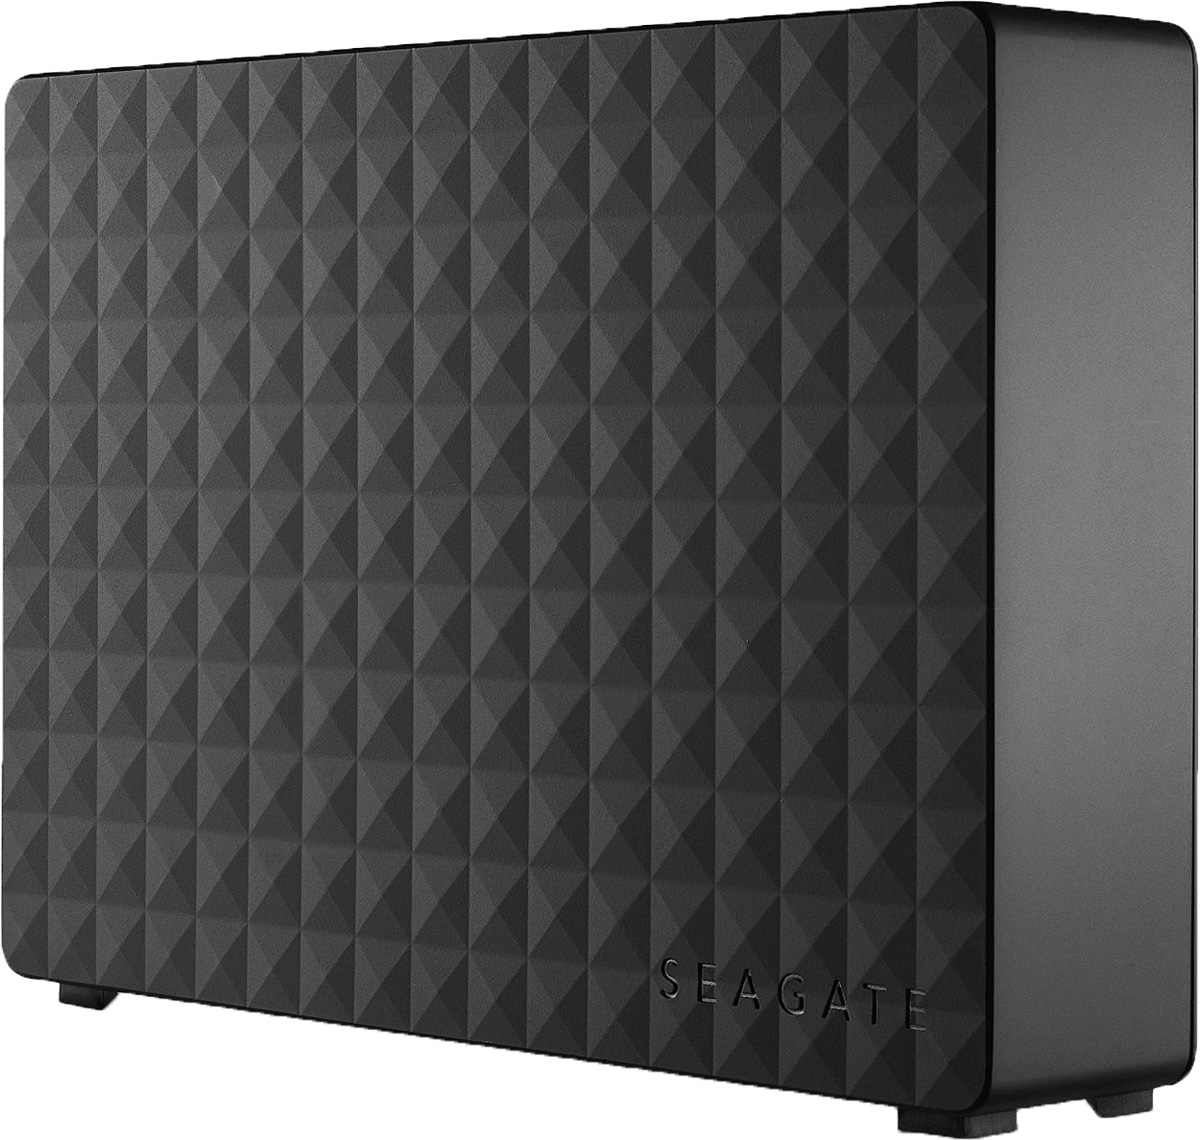 Seagate Expansion Desk 4TB USB 3.0 внешний жесткий диск (STEB4000200) цены онлайн